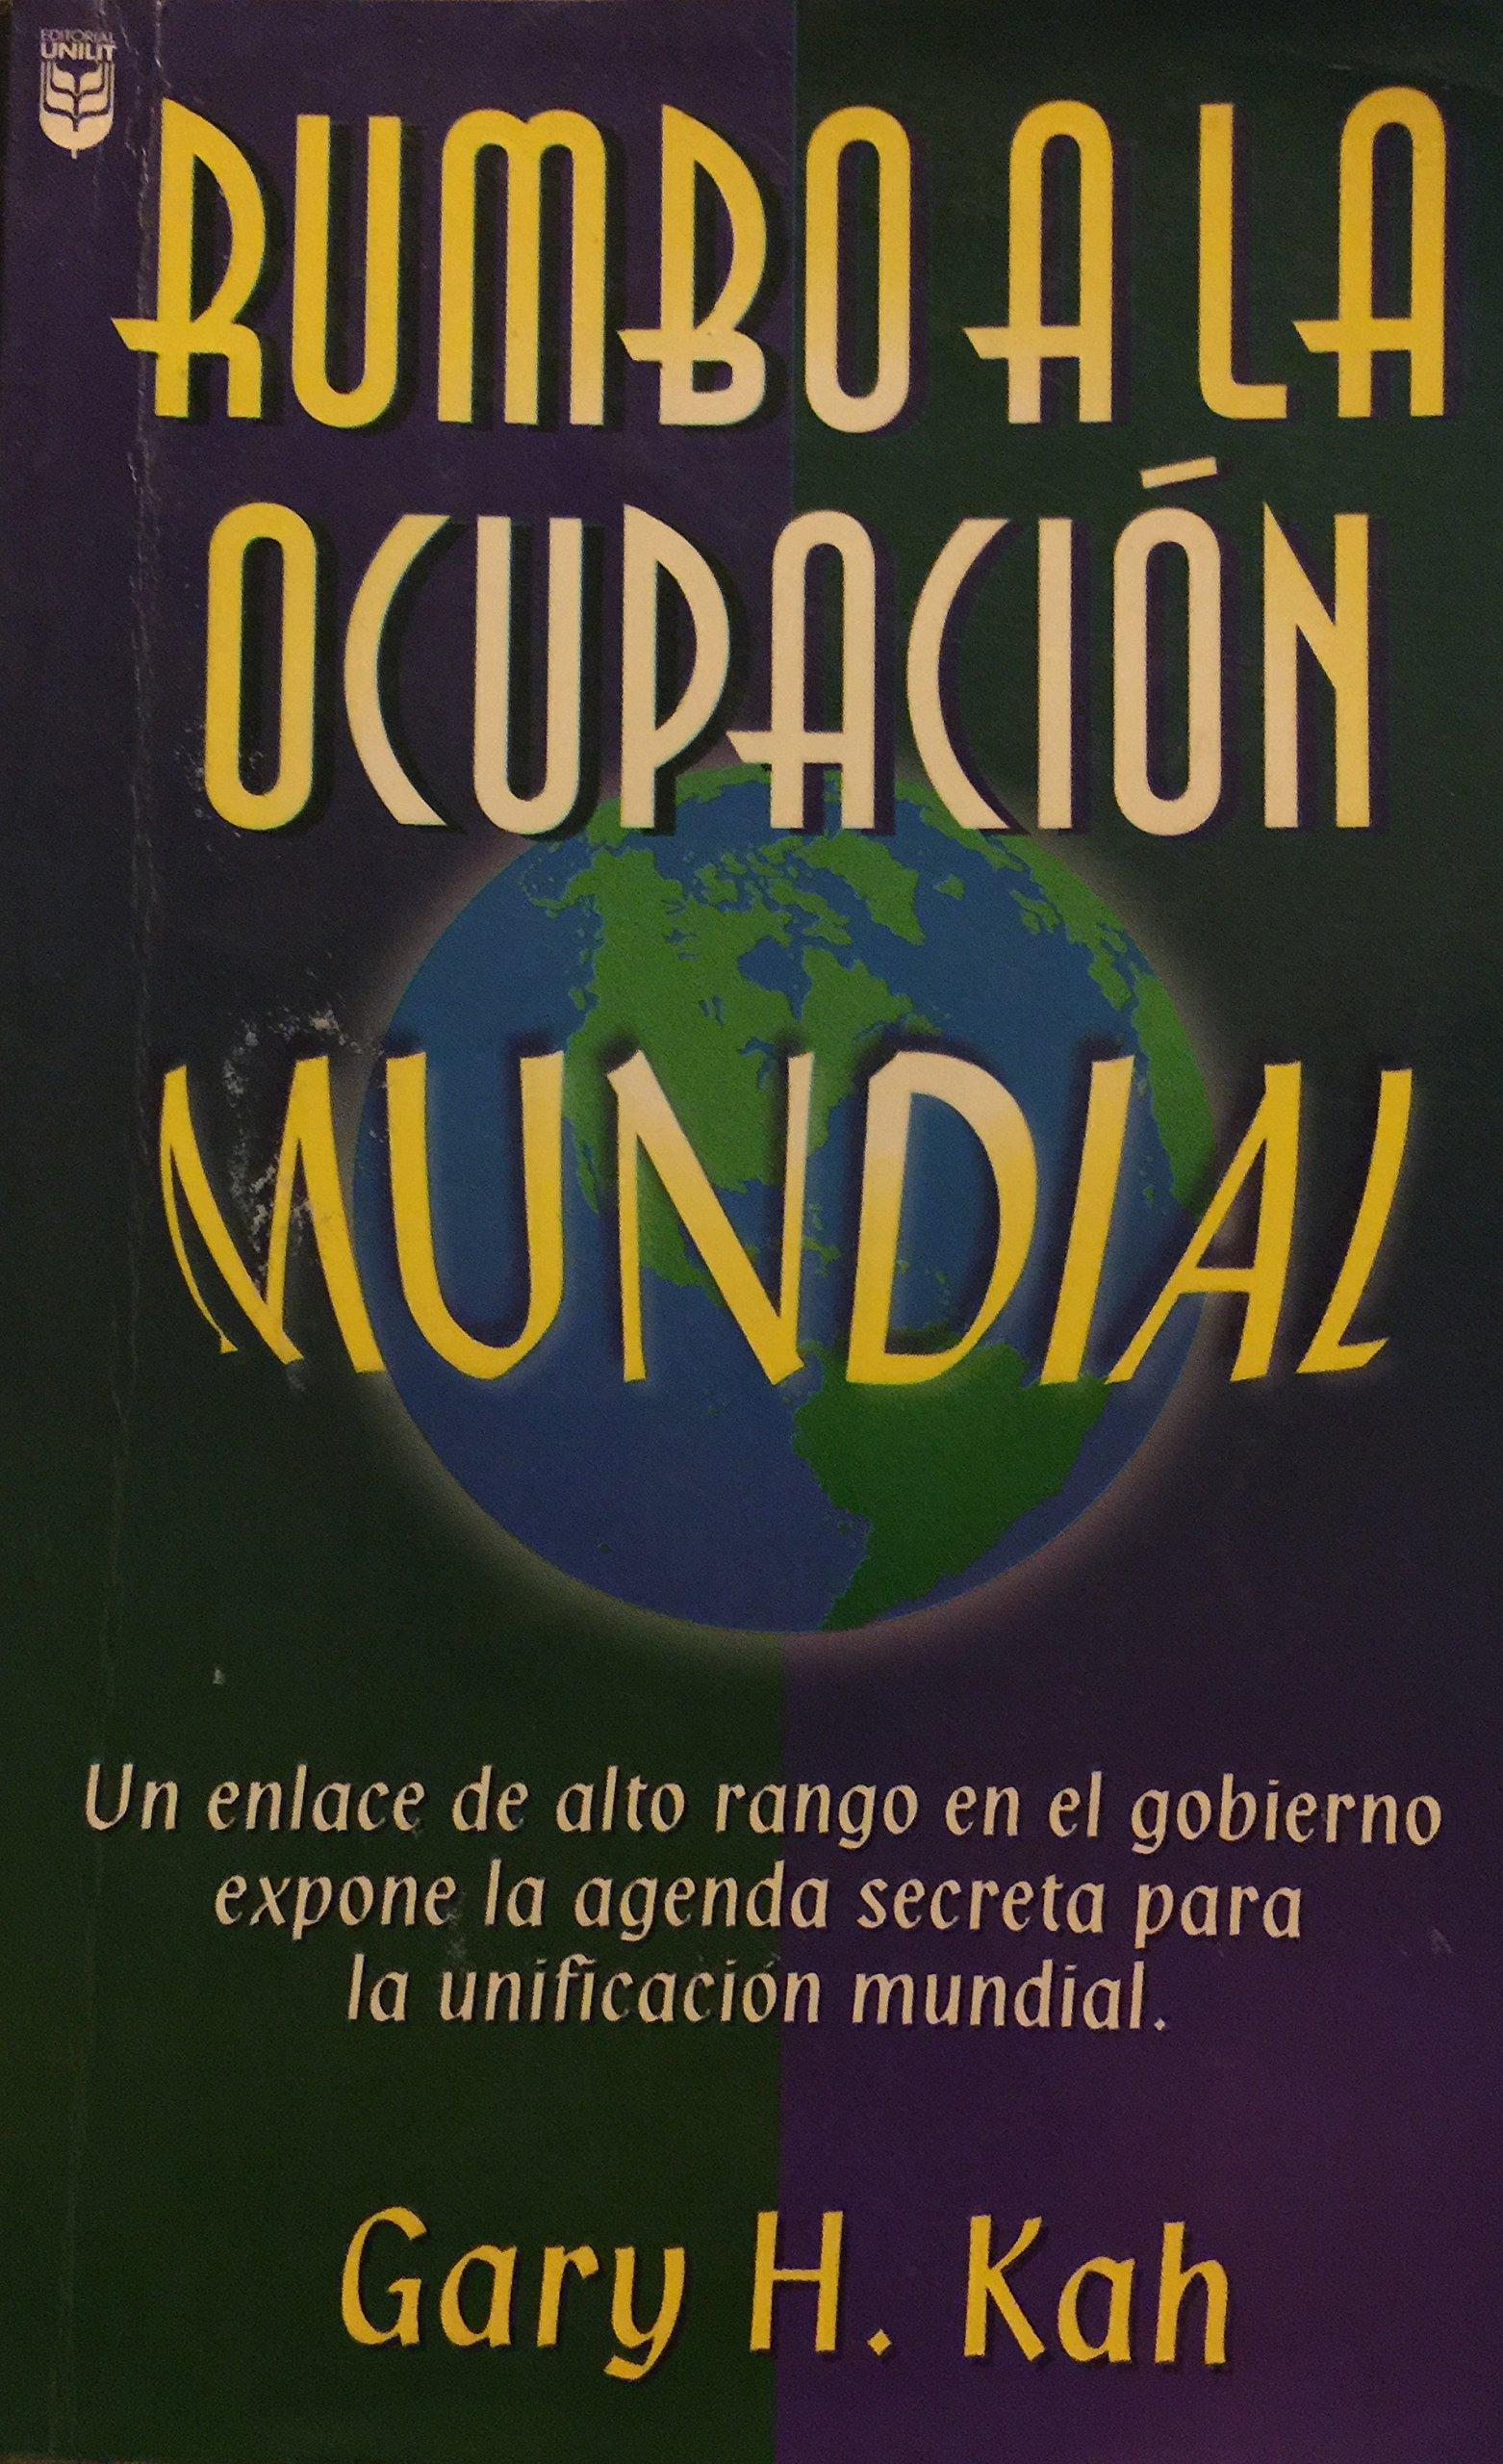 Rumbo a la Ocupacion Mundial (Spanish Edition): Gary H. Kah ...